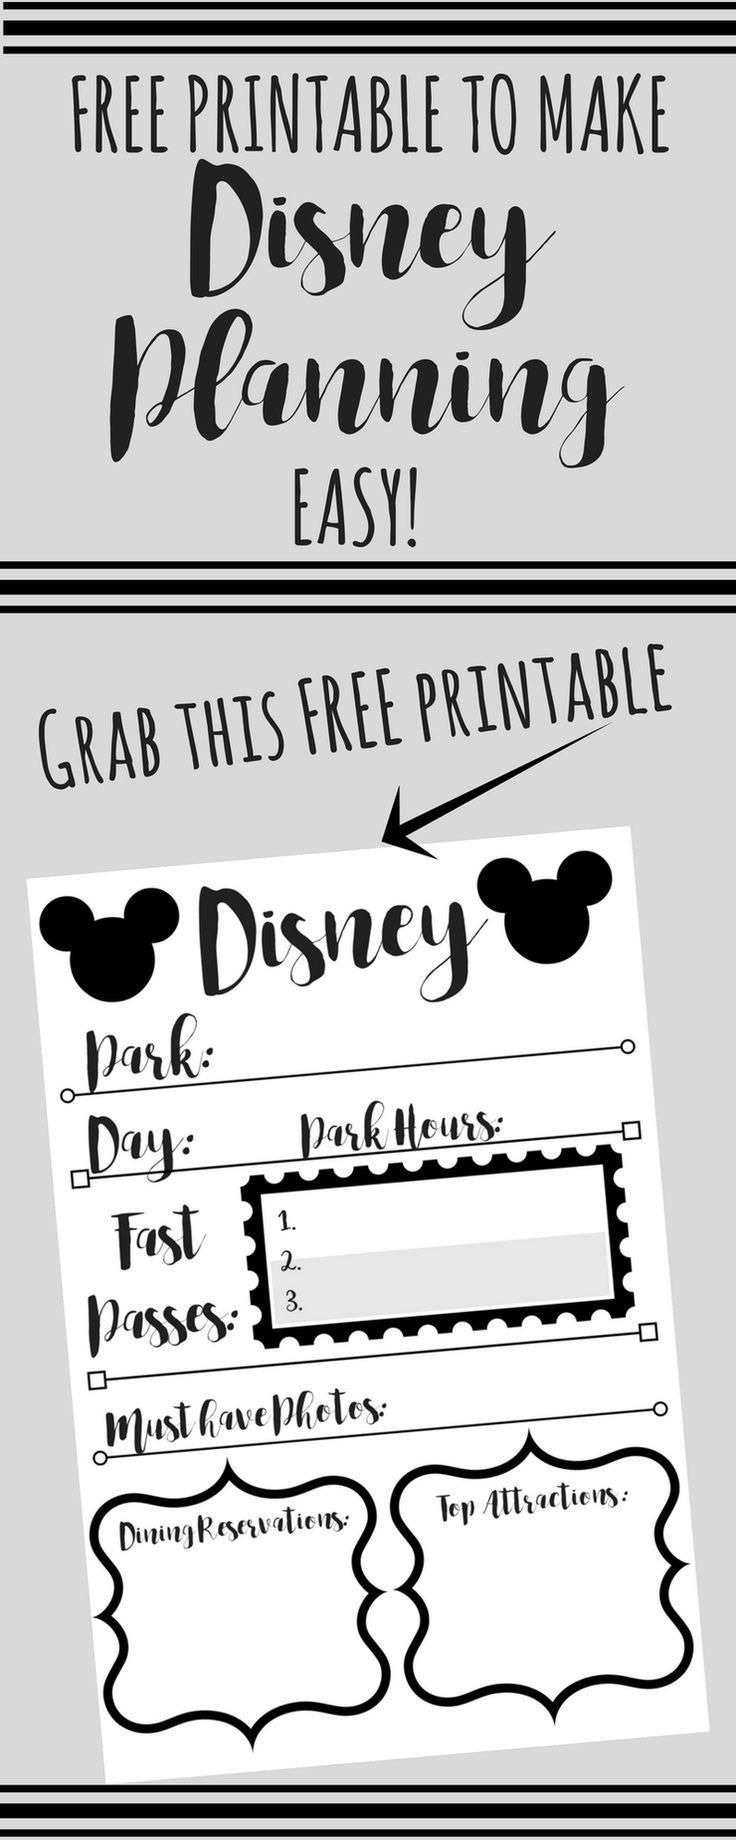 Disney Trip Planning Printable